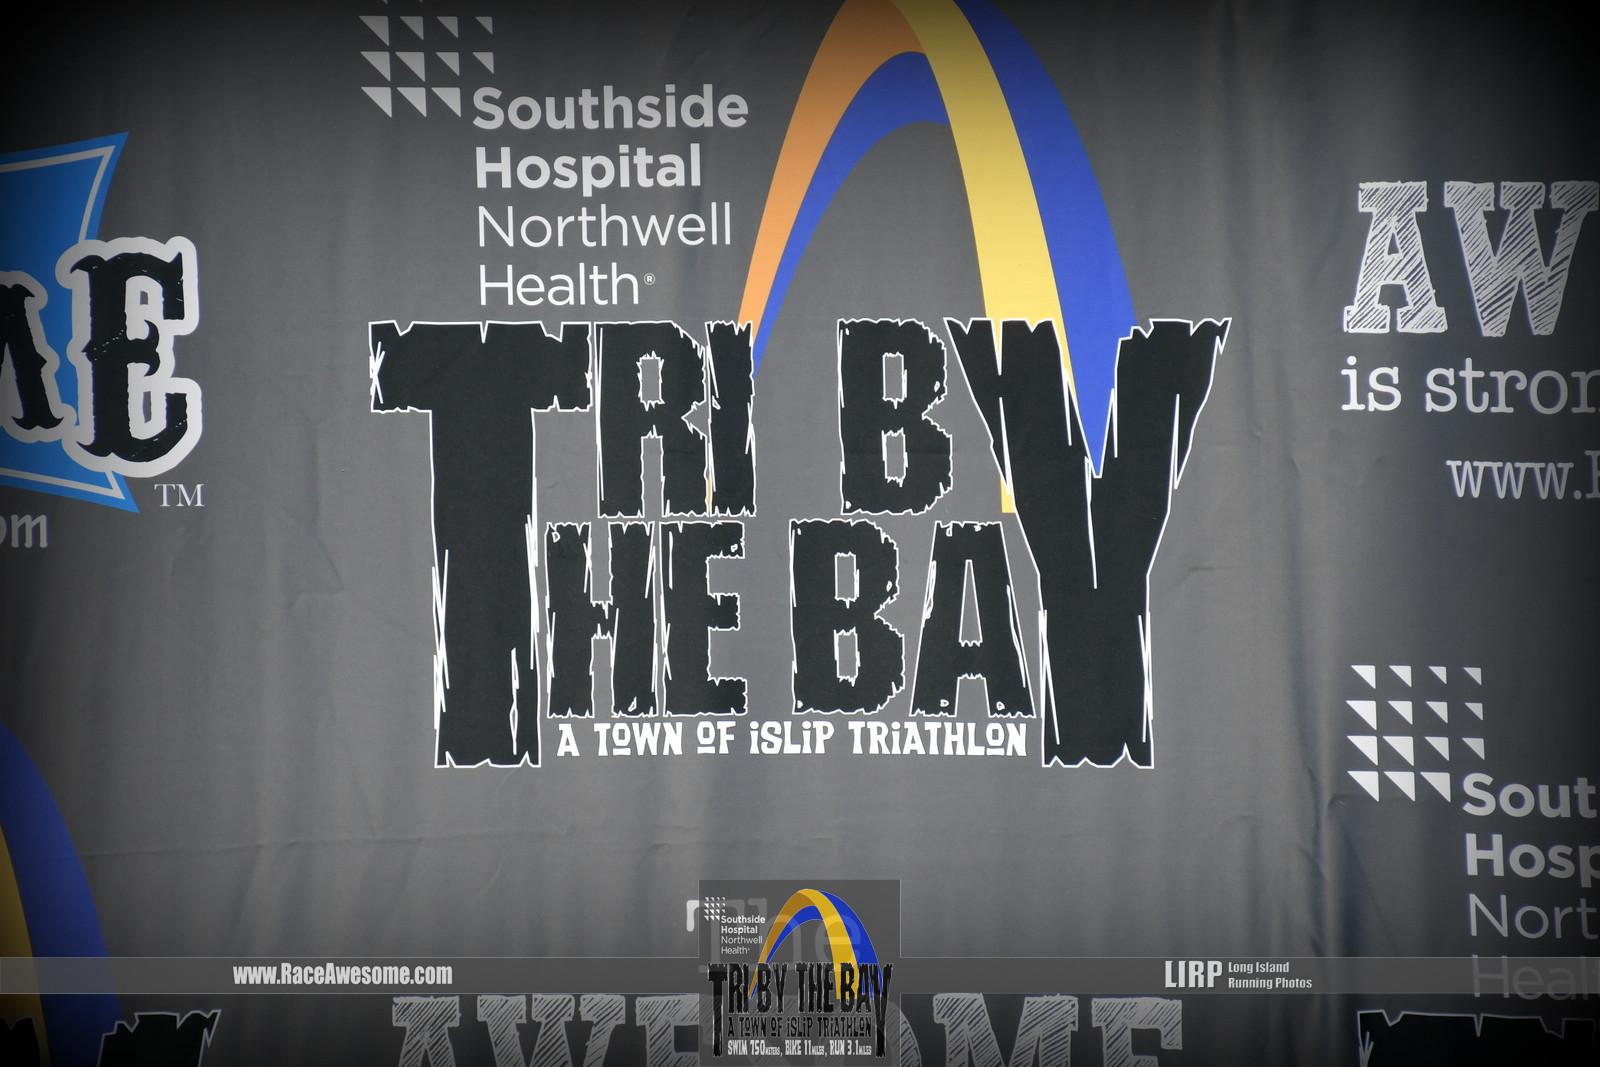 Southside Hospital - Northwell Health